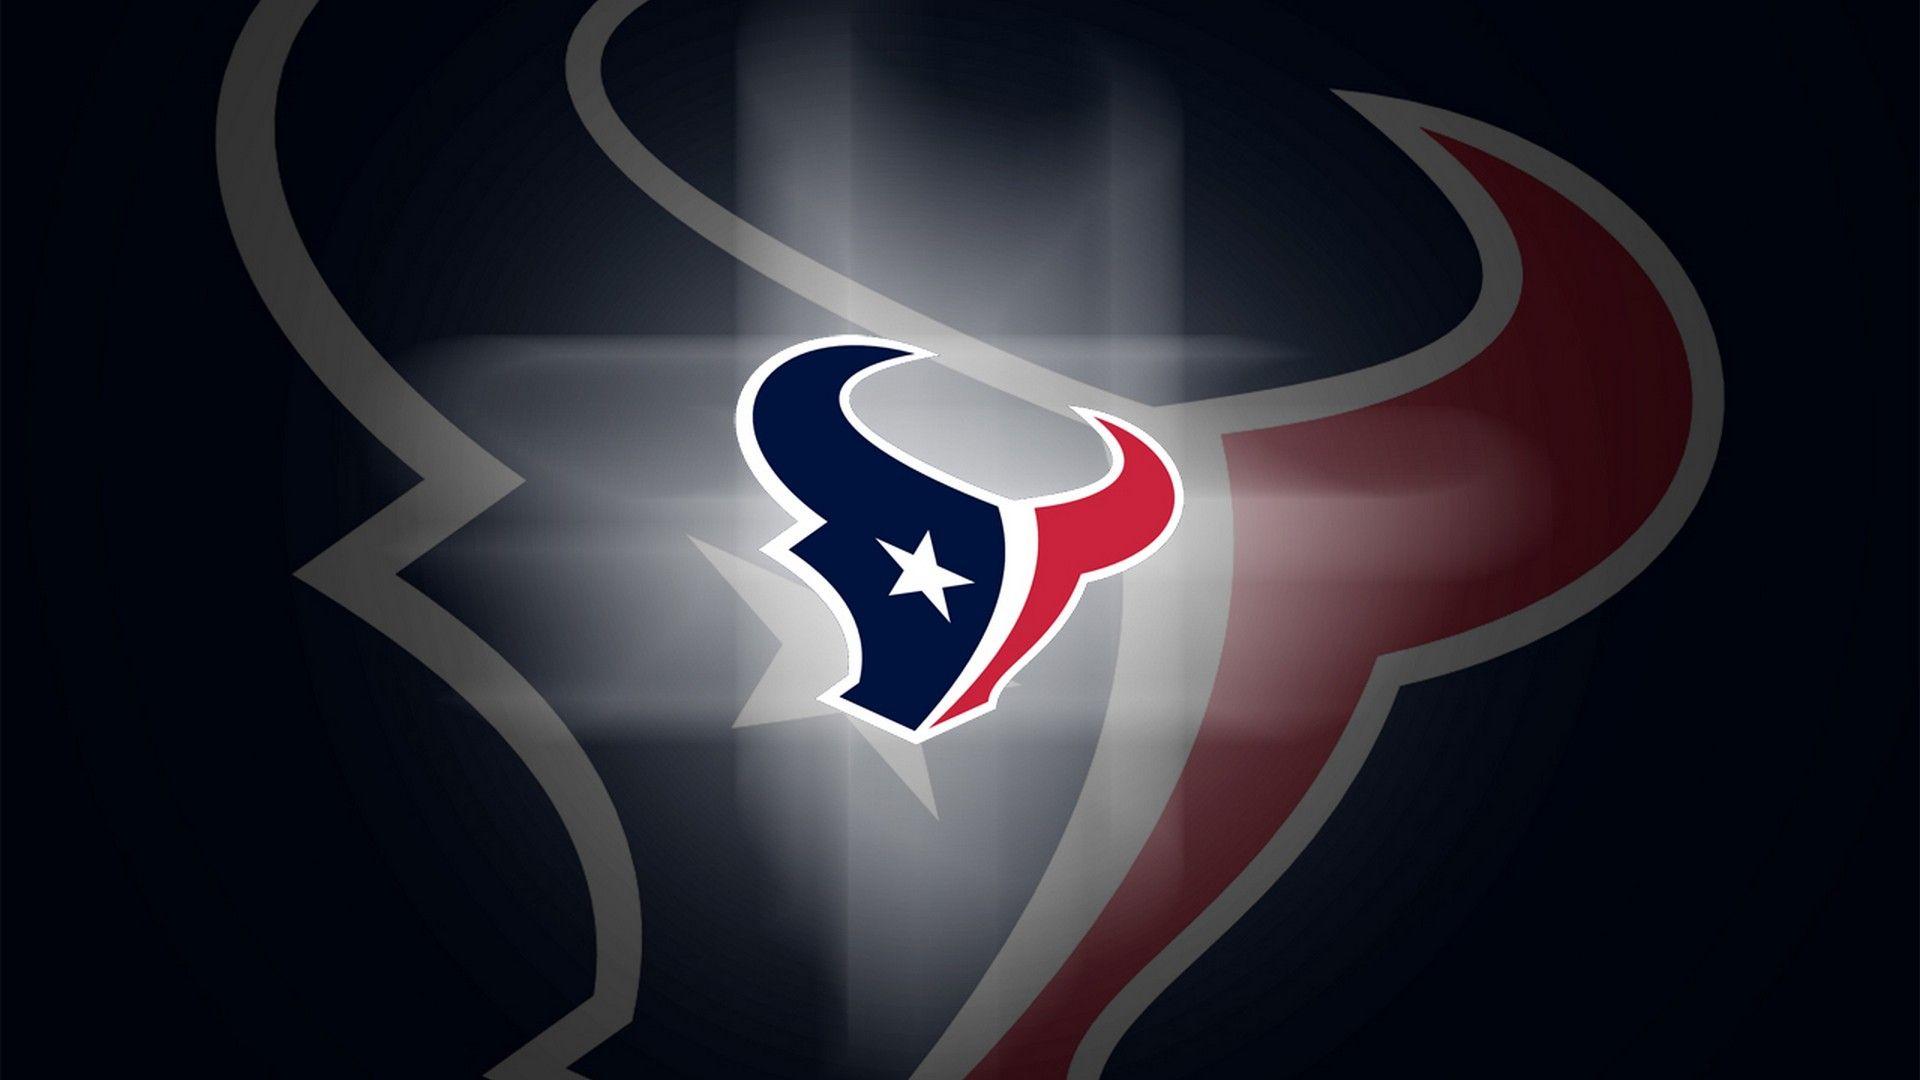 Nfl Wallpapers Texans Football Houston Texans Sports Wallpapers